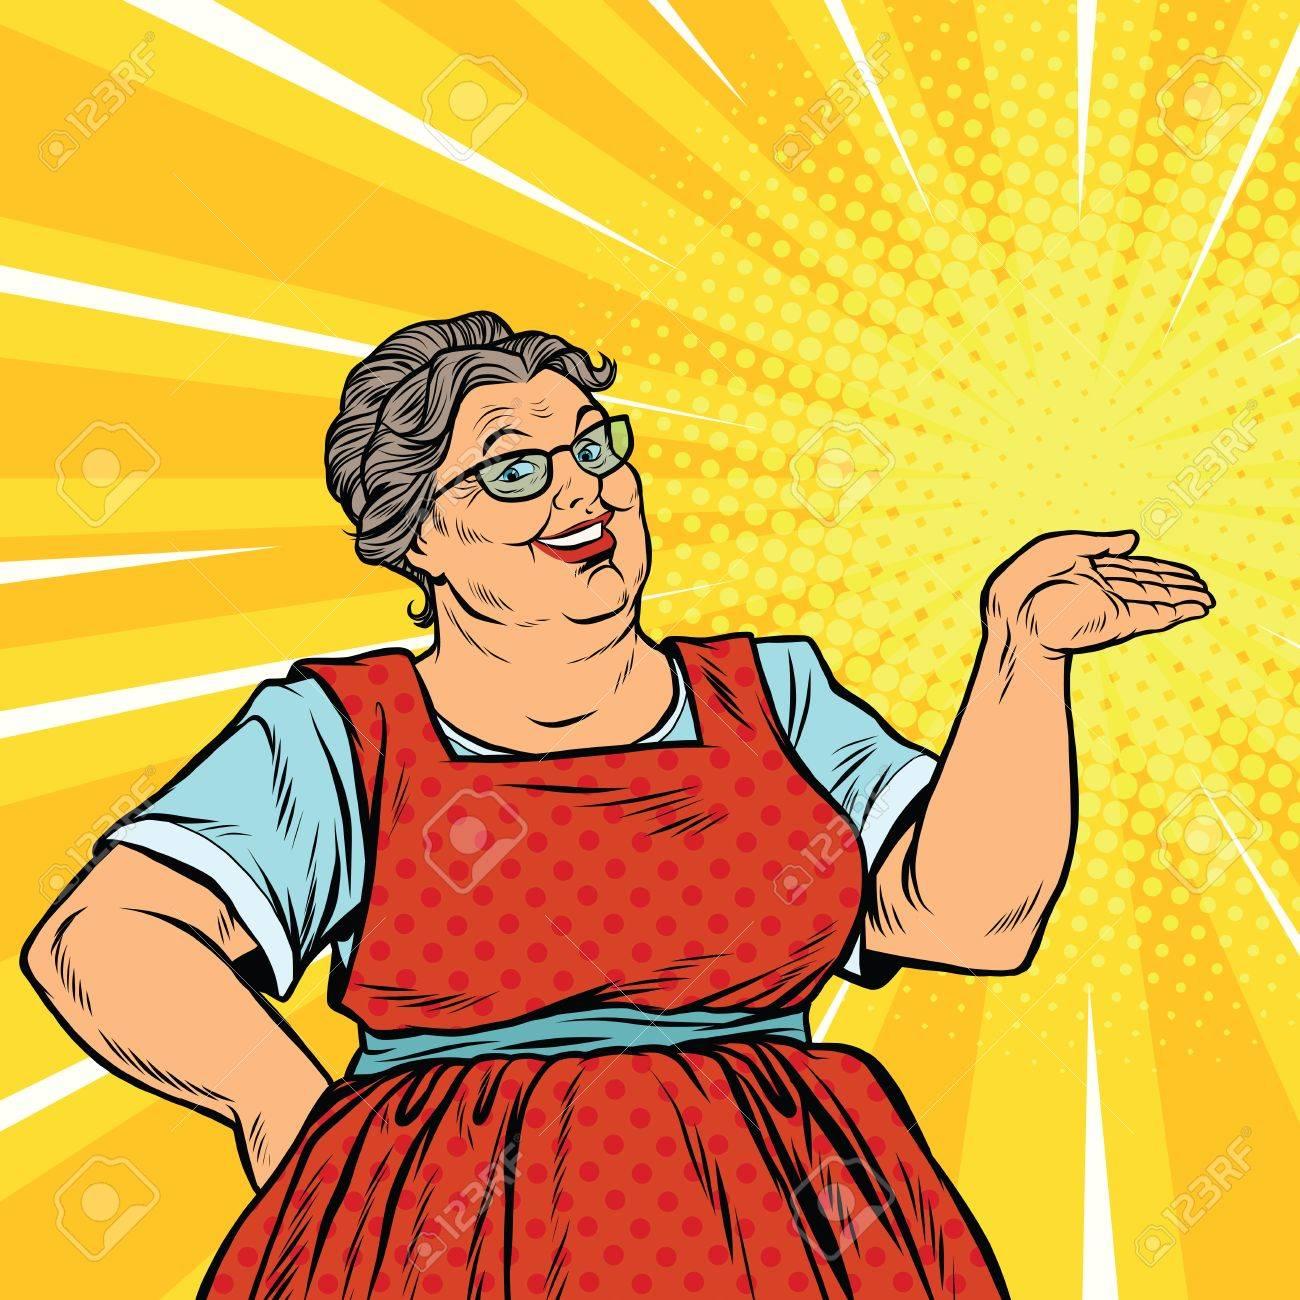 Joyful woman grandma promoter, pop art retro vector illustration. Old sweet woman advertises - 64068551